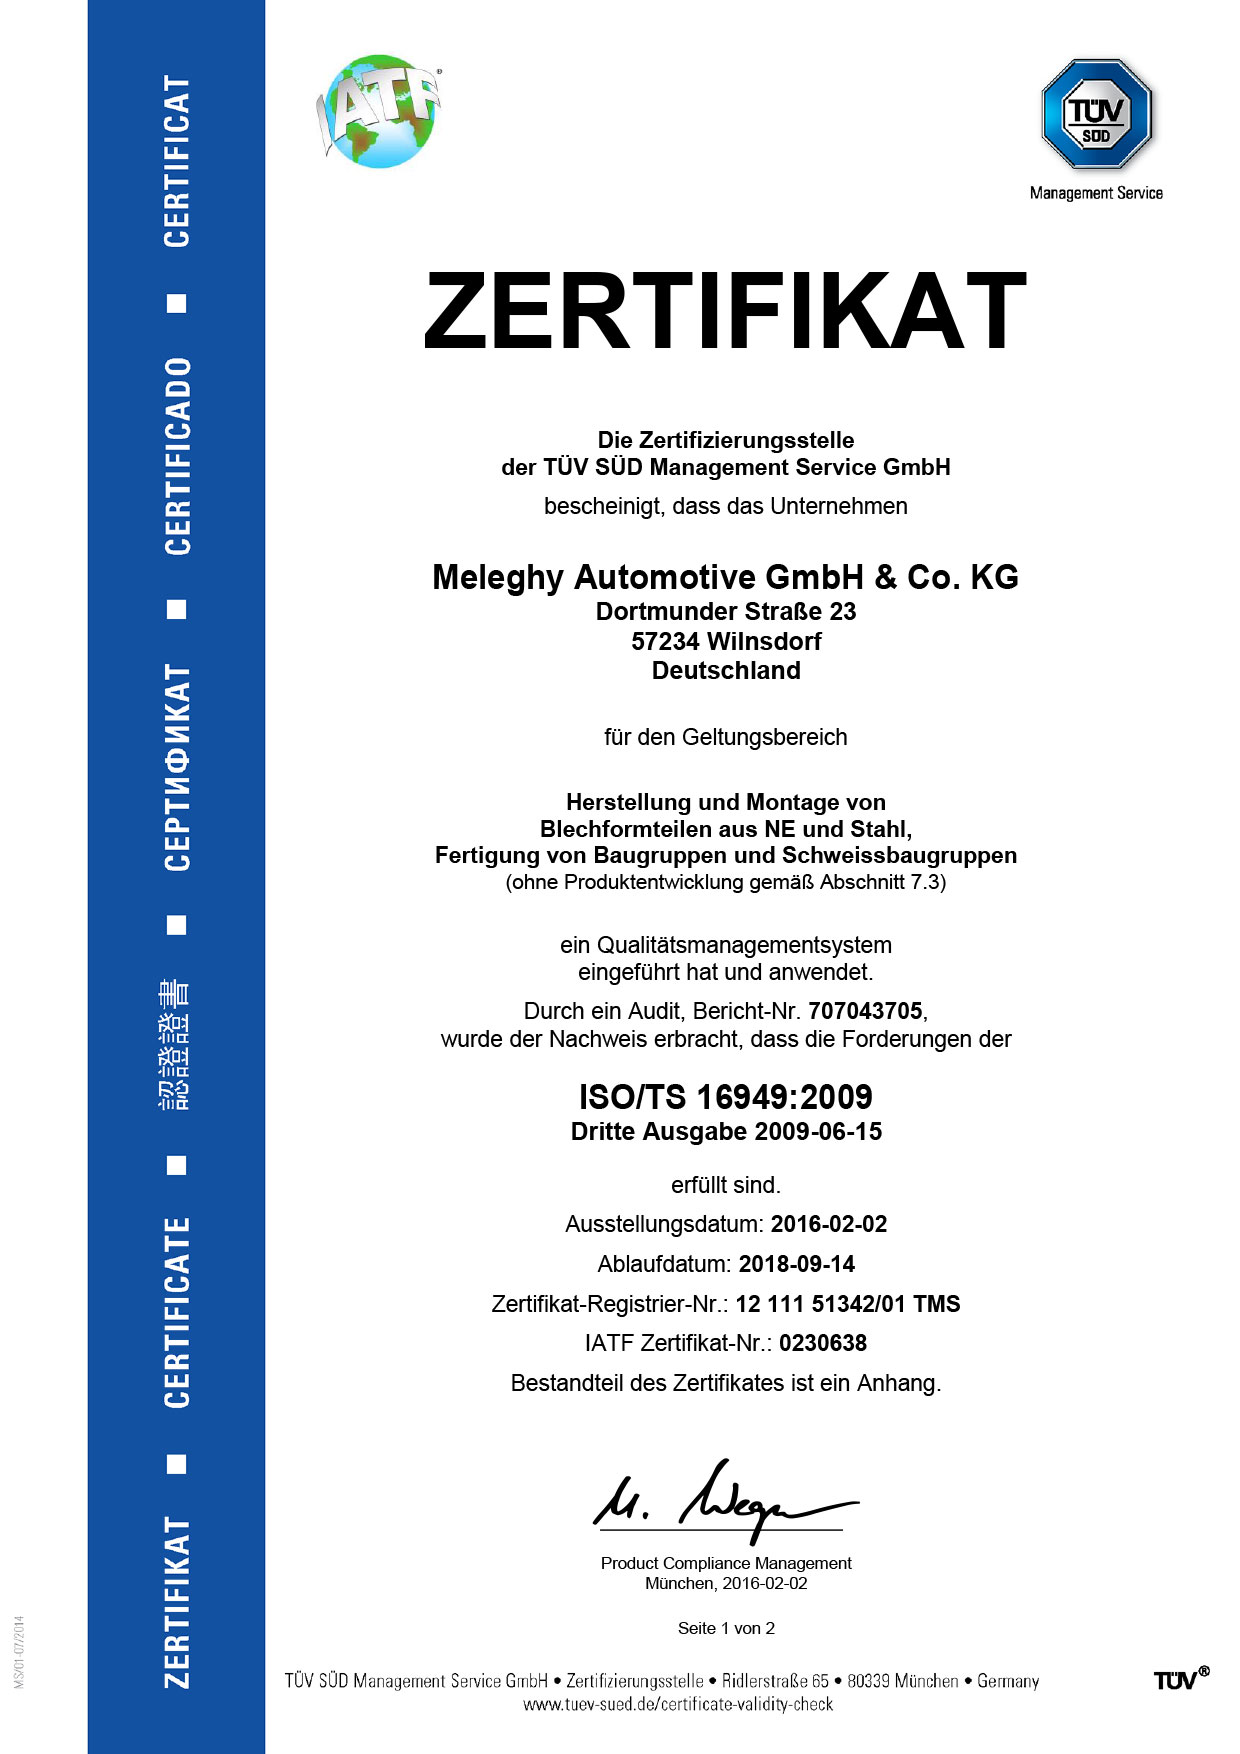 Meleghy Automotive Wilnsdorf Zertifikat ISO_TS-16949_de